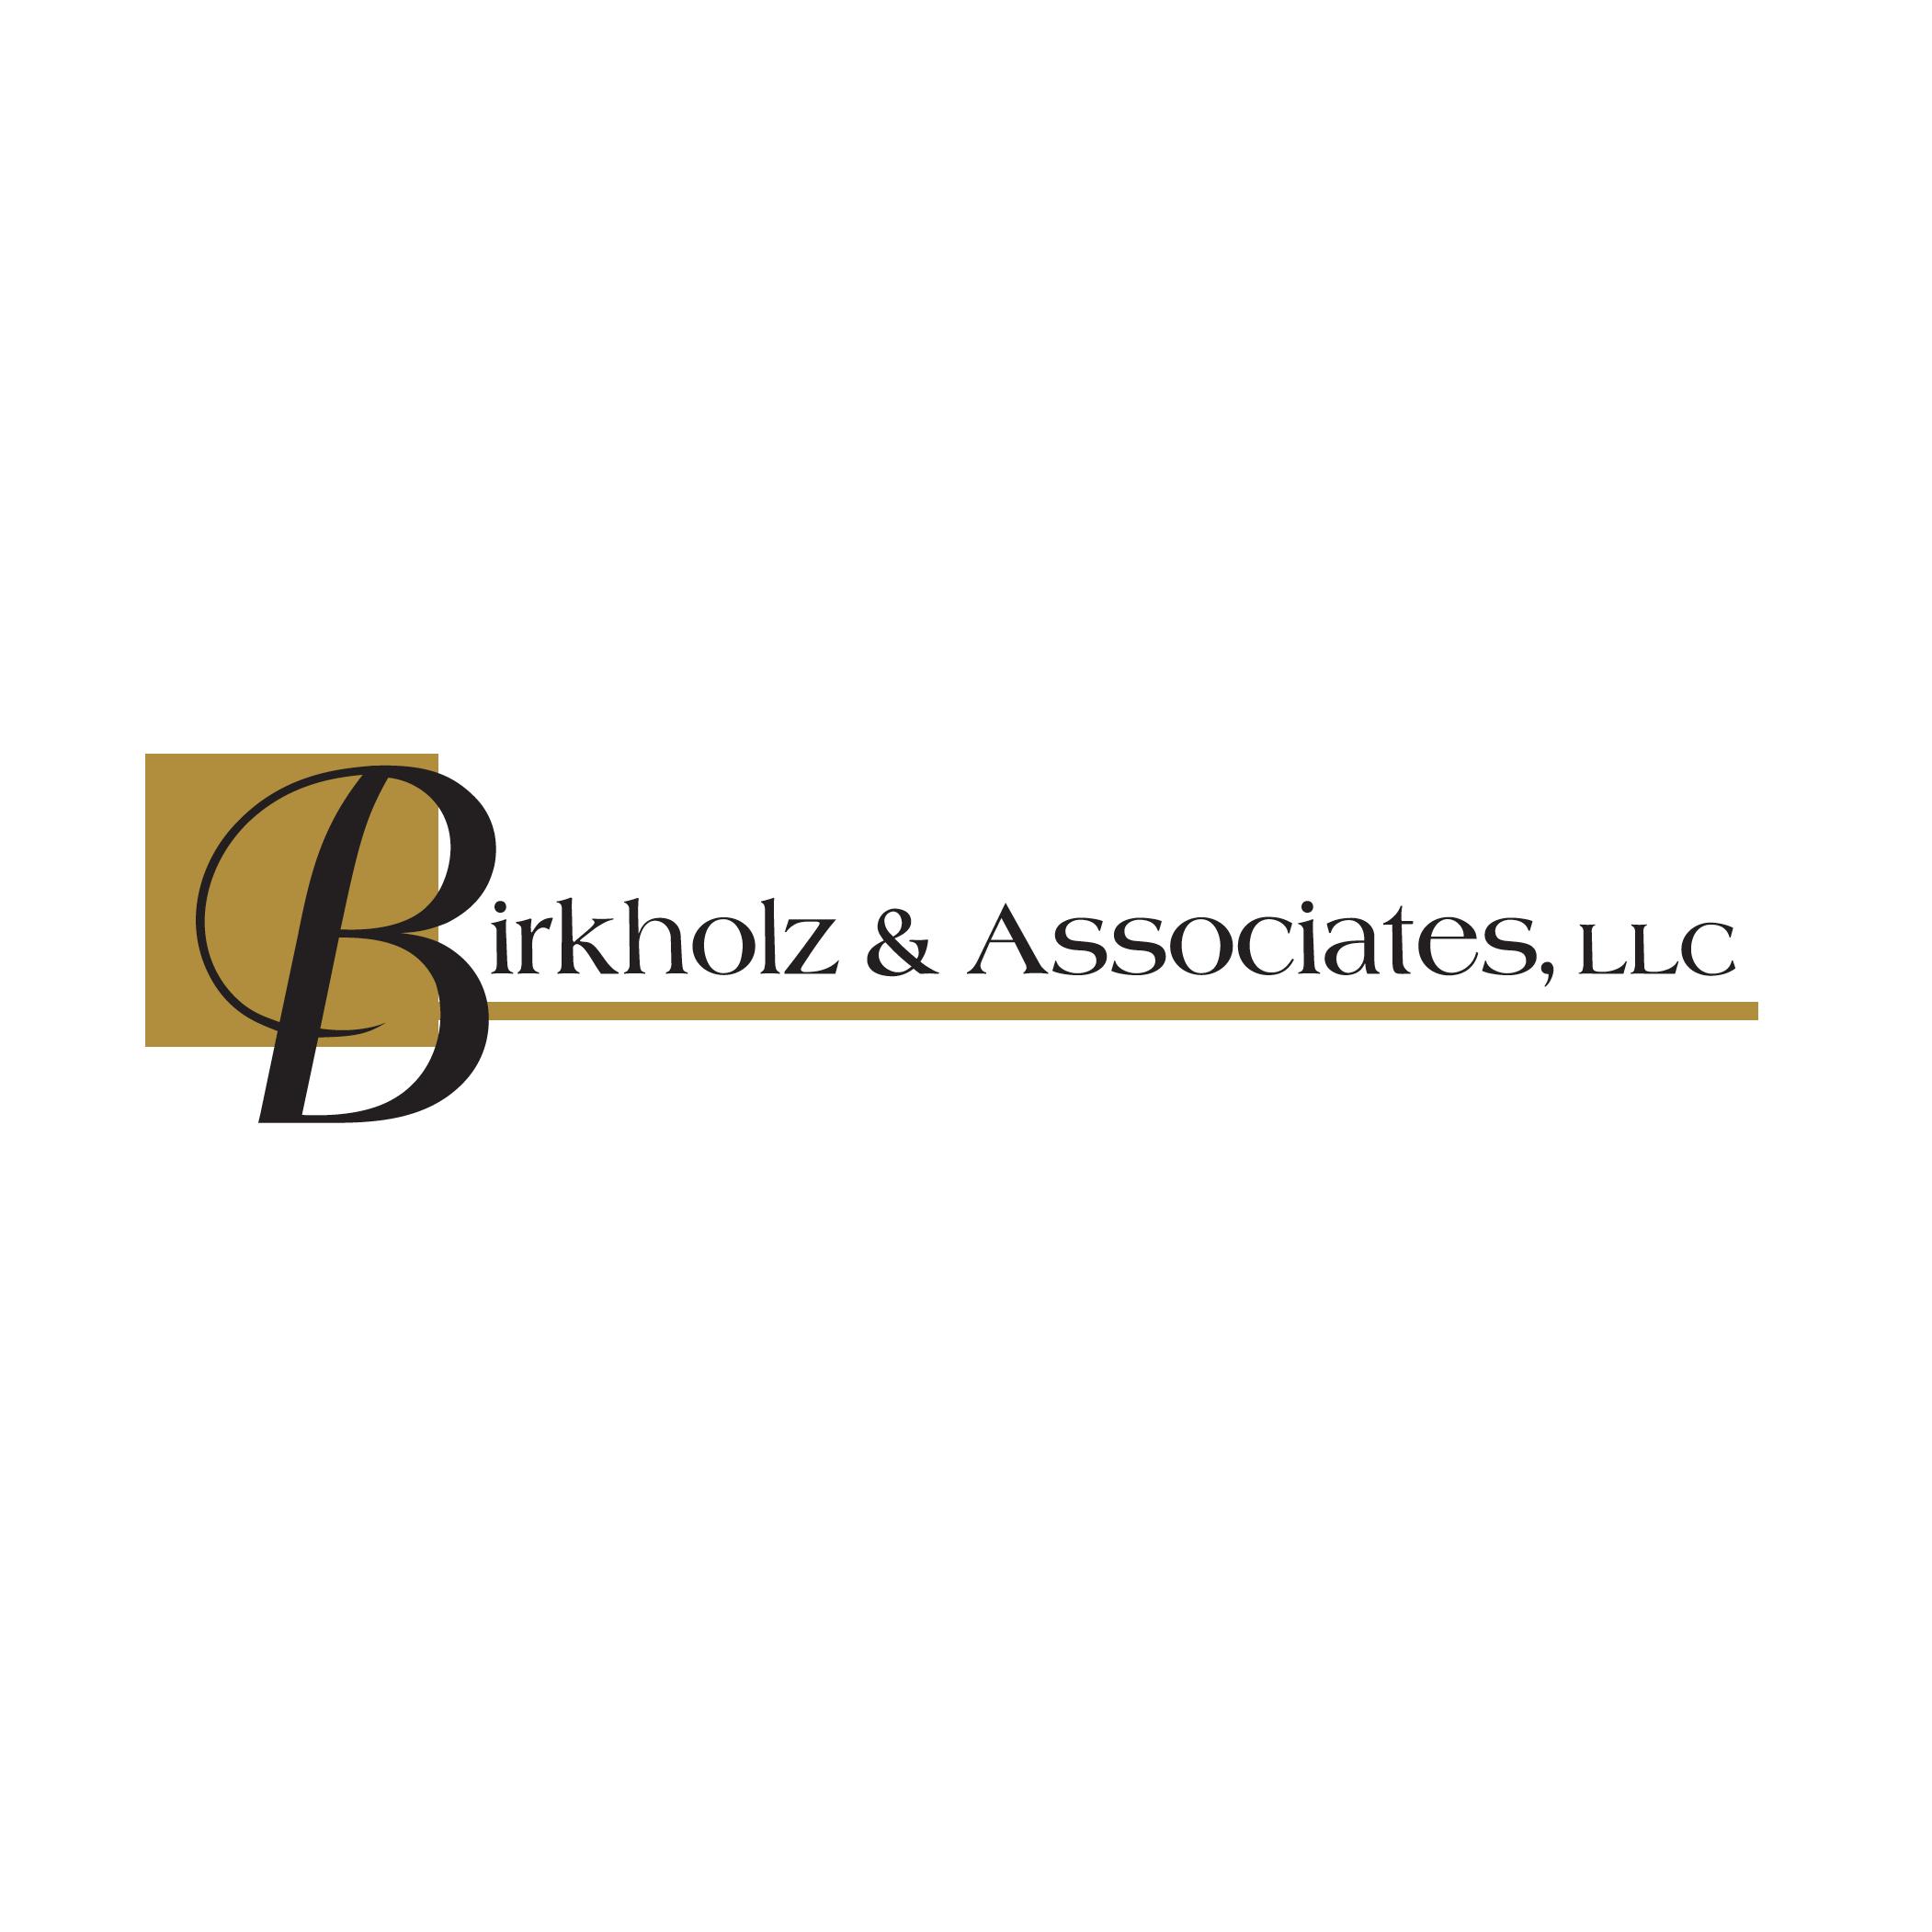 Birkholz & Associates - Mankato Divorce, Family Law & Criminal Defense Attorneys